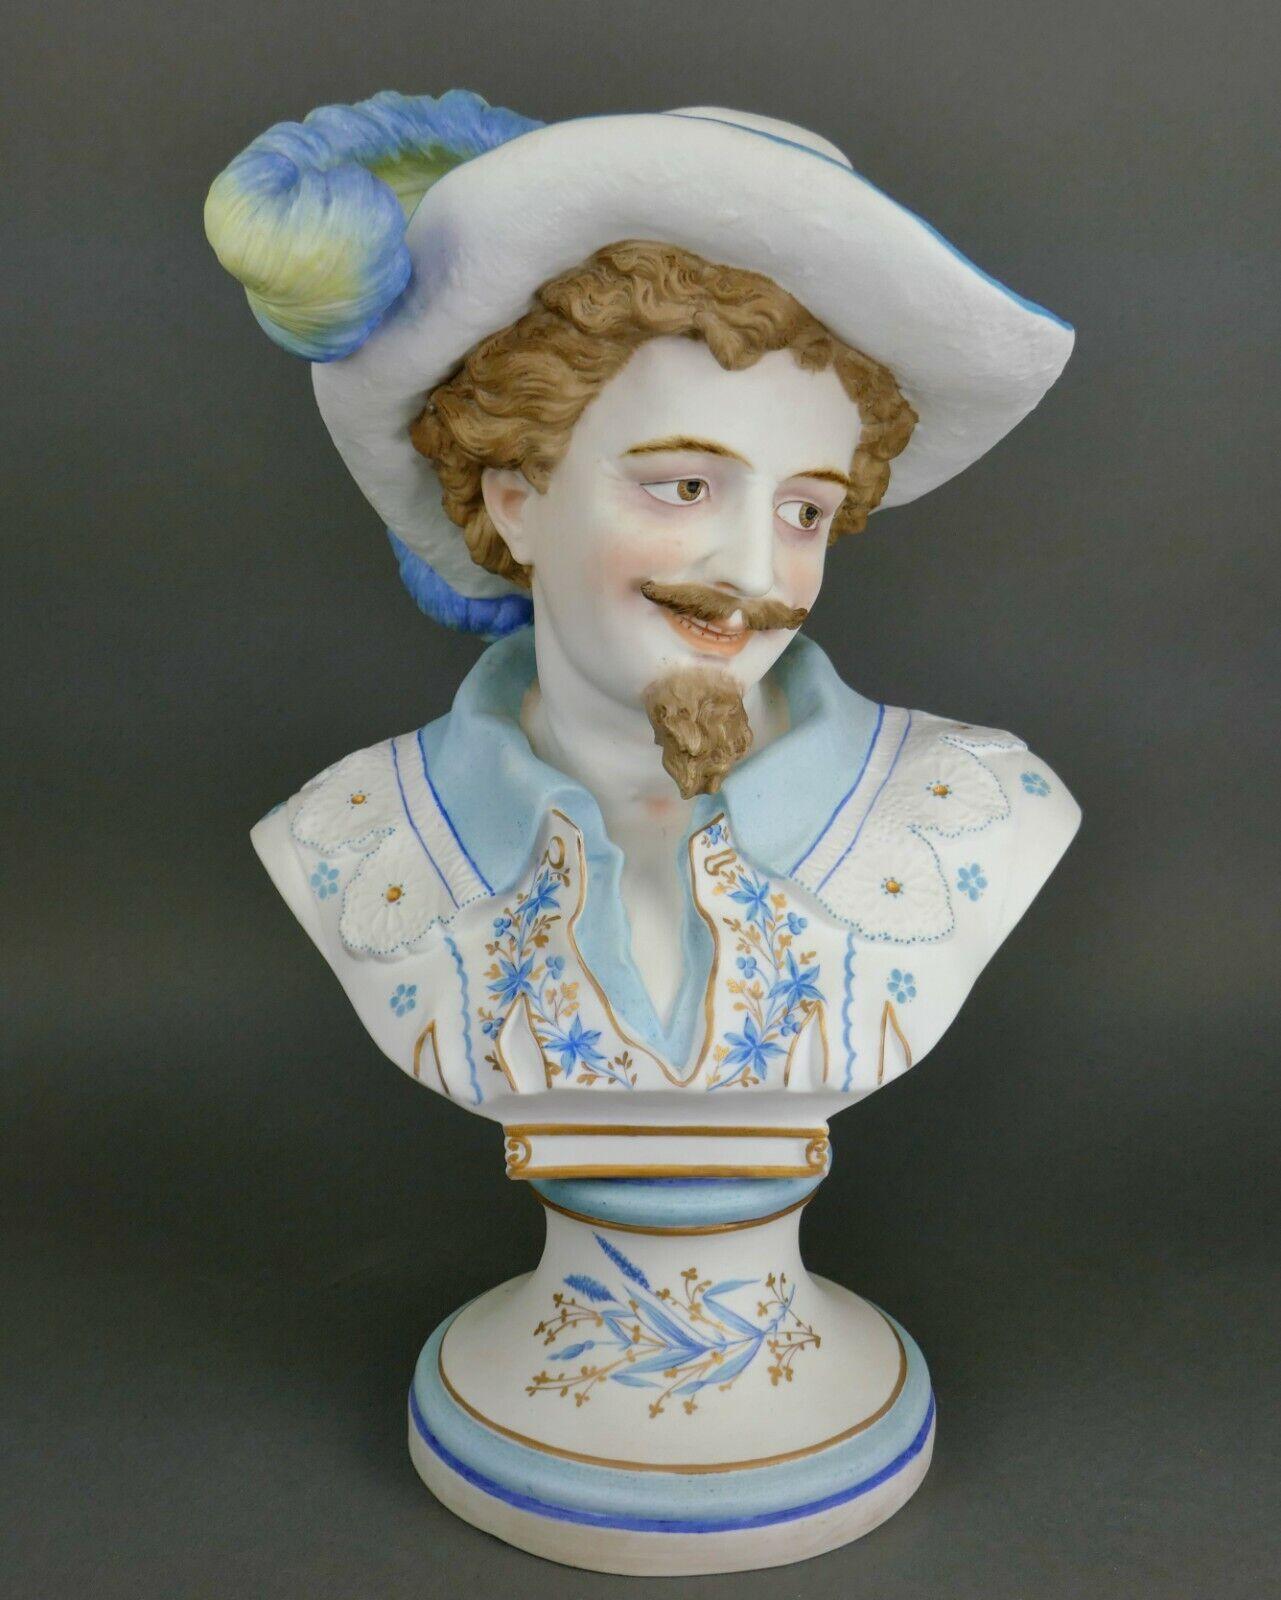 Fine Antique French Samson Bisque Porcelain Bust Of King Louis XIII Sculpture - $11.50